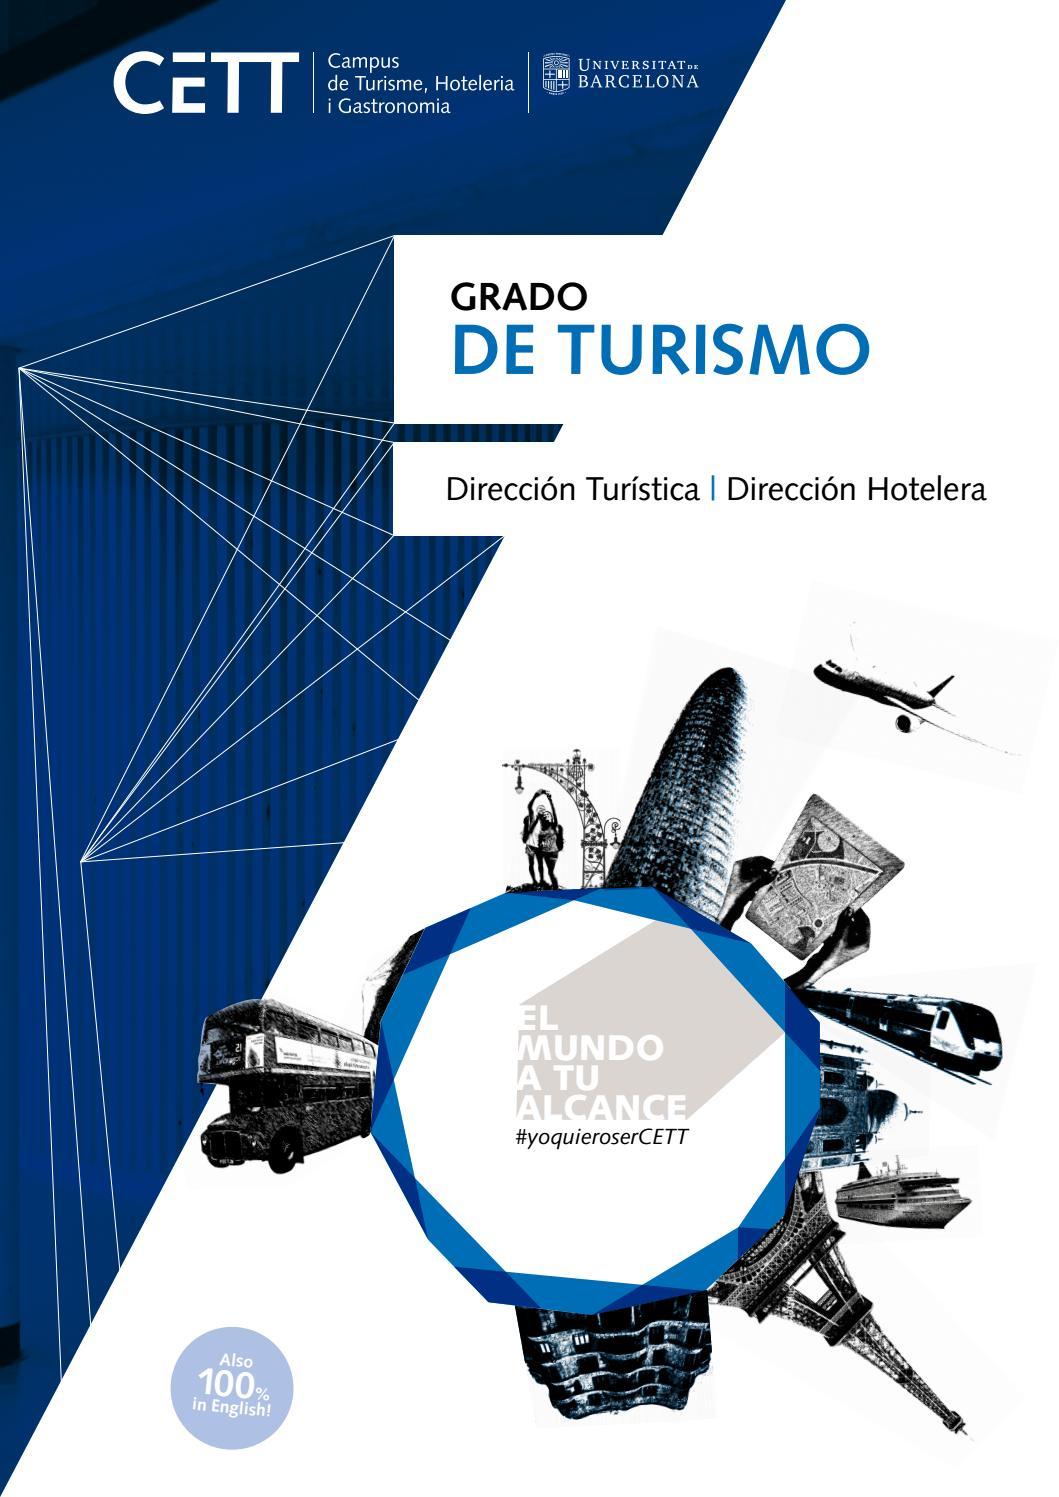 Grado de Turismo CETT-UB by Grup CETT - issuu